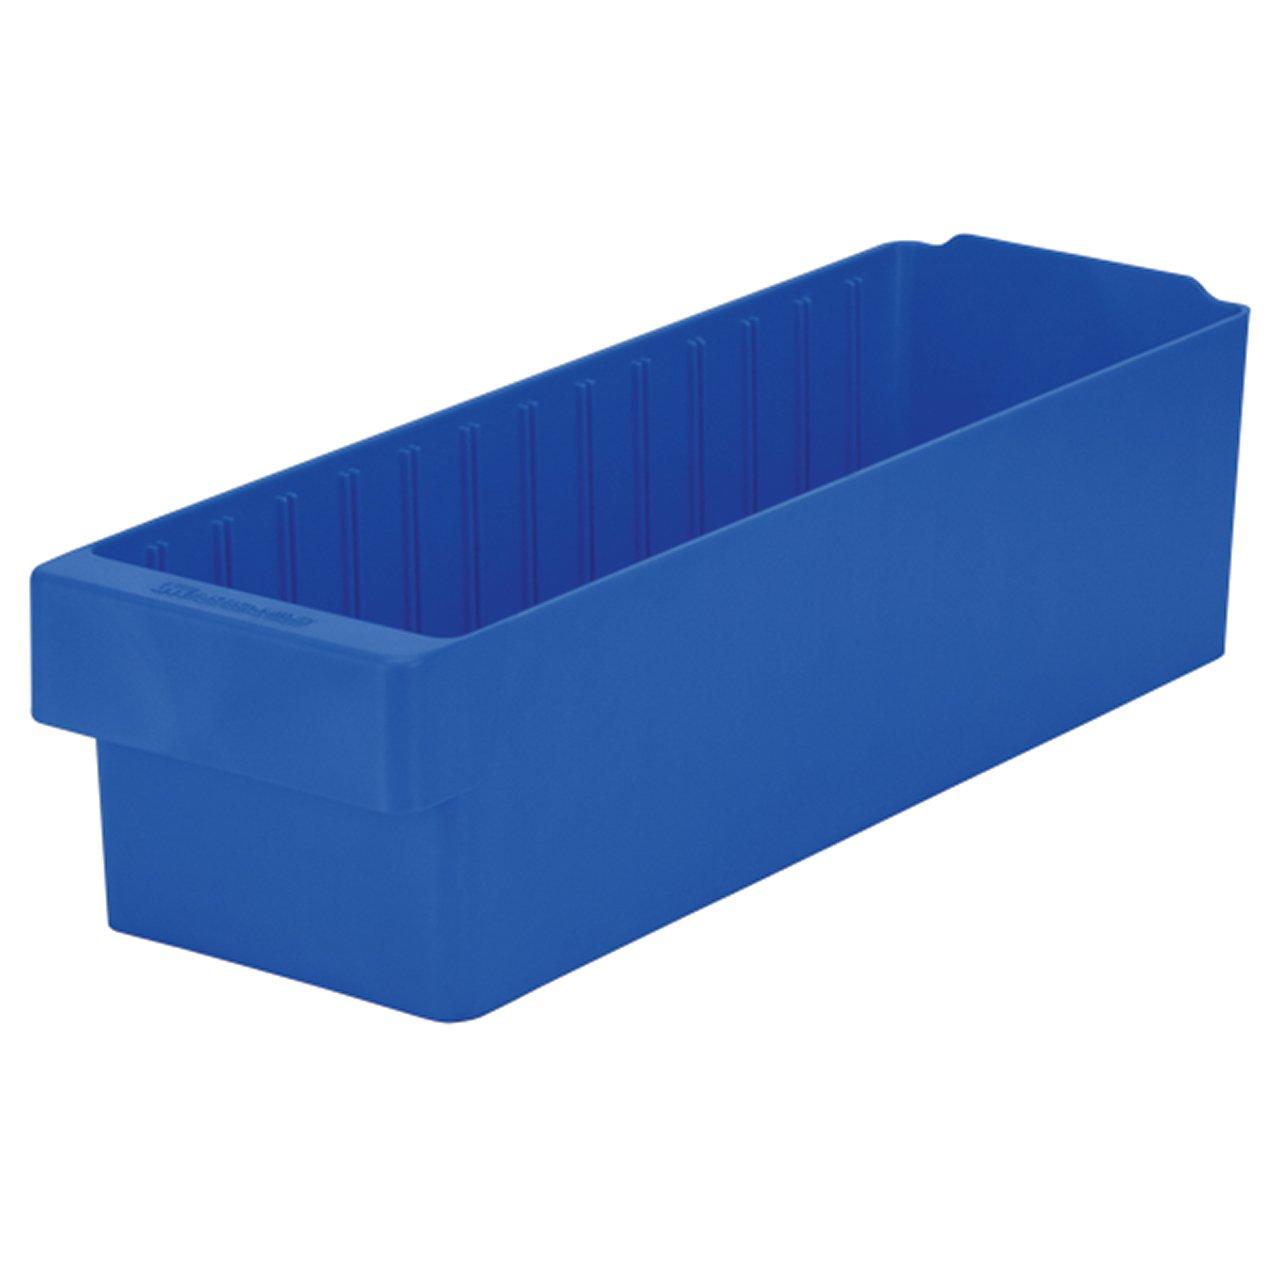 "akro-mils 31168 AkroDrawerプラスチックストレージ引き出し、17 – 5 / 8 "" L x 5 – 9 / 16 "" W x 4 – 5 / 8 "" H B0042RTMHY ブルー ブルー"